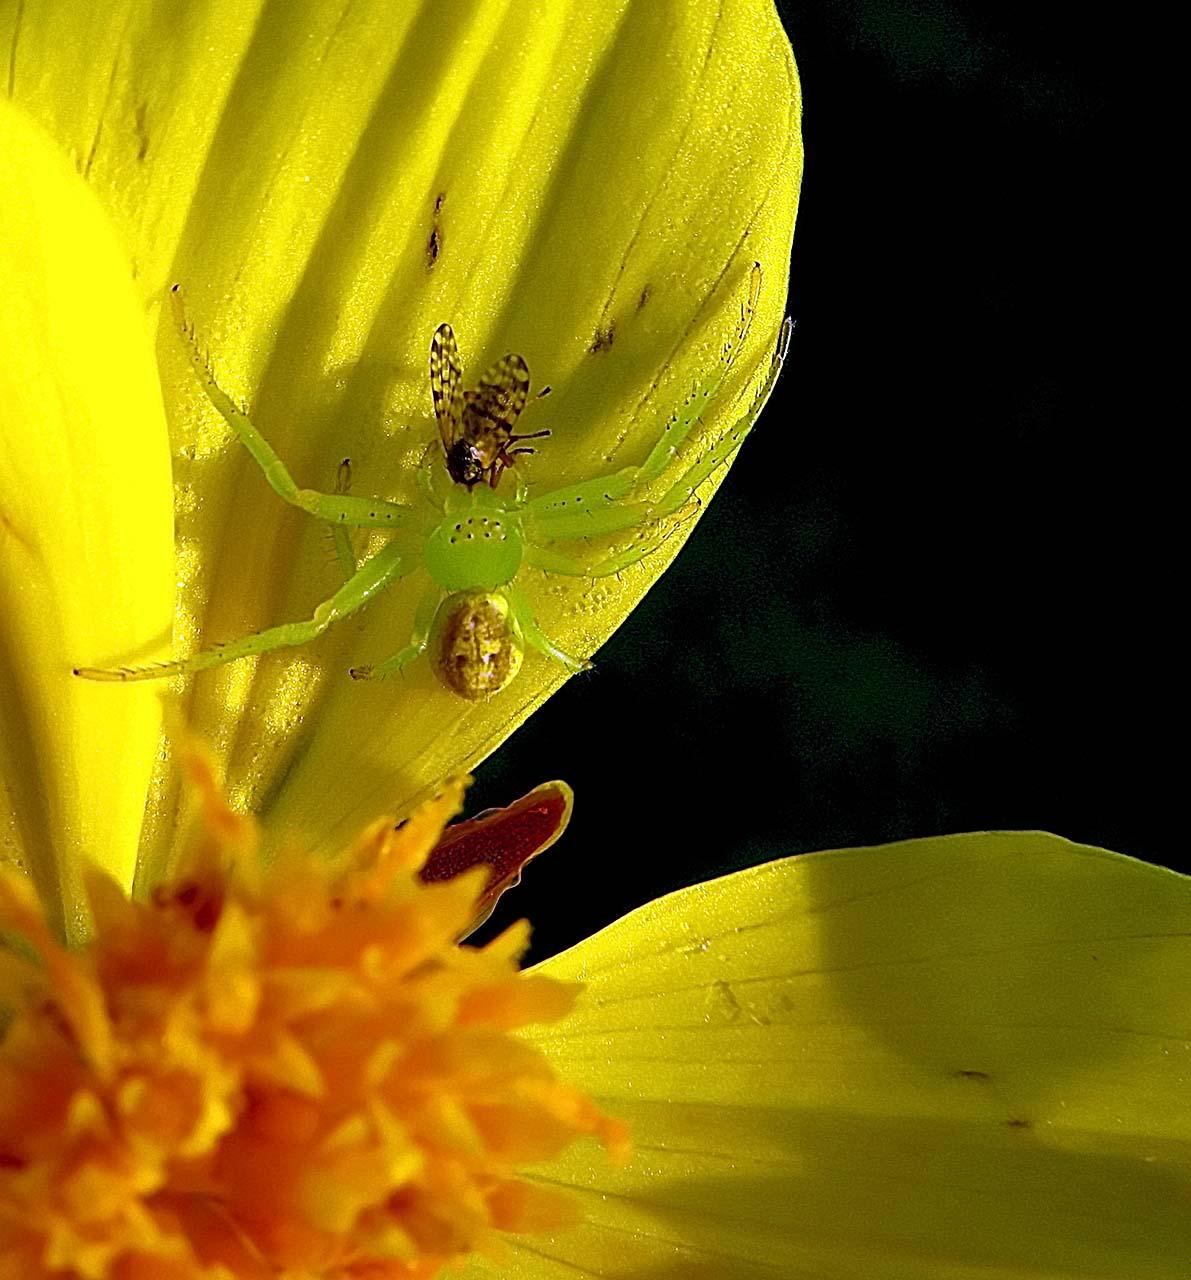 A little green spider enjoying his breakfast